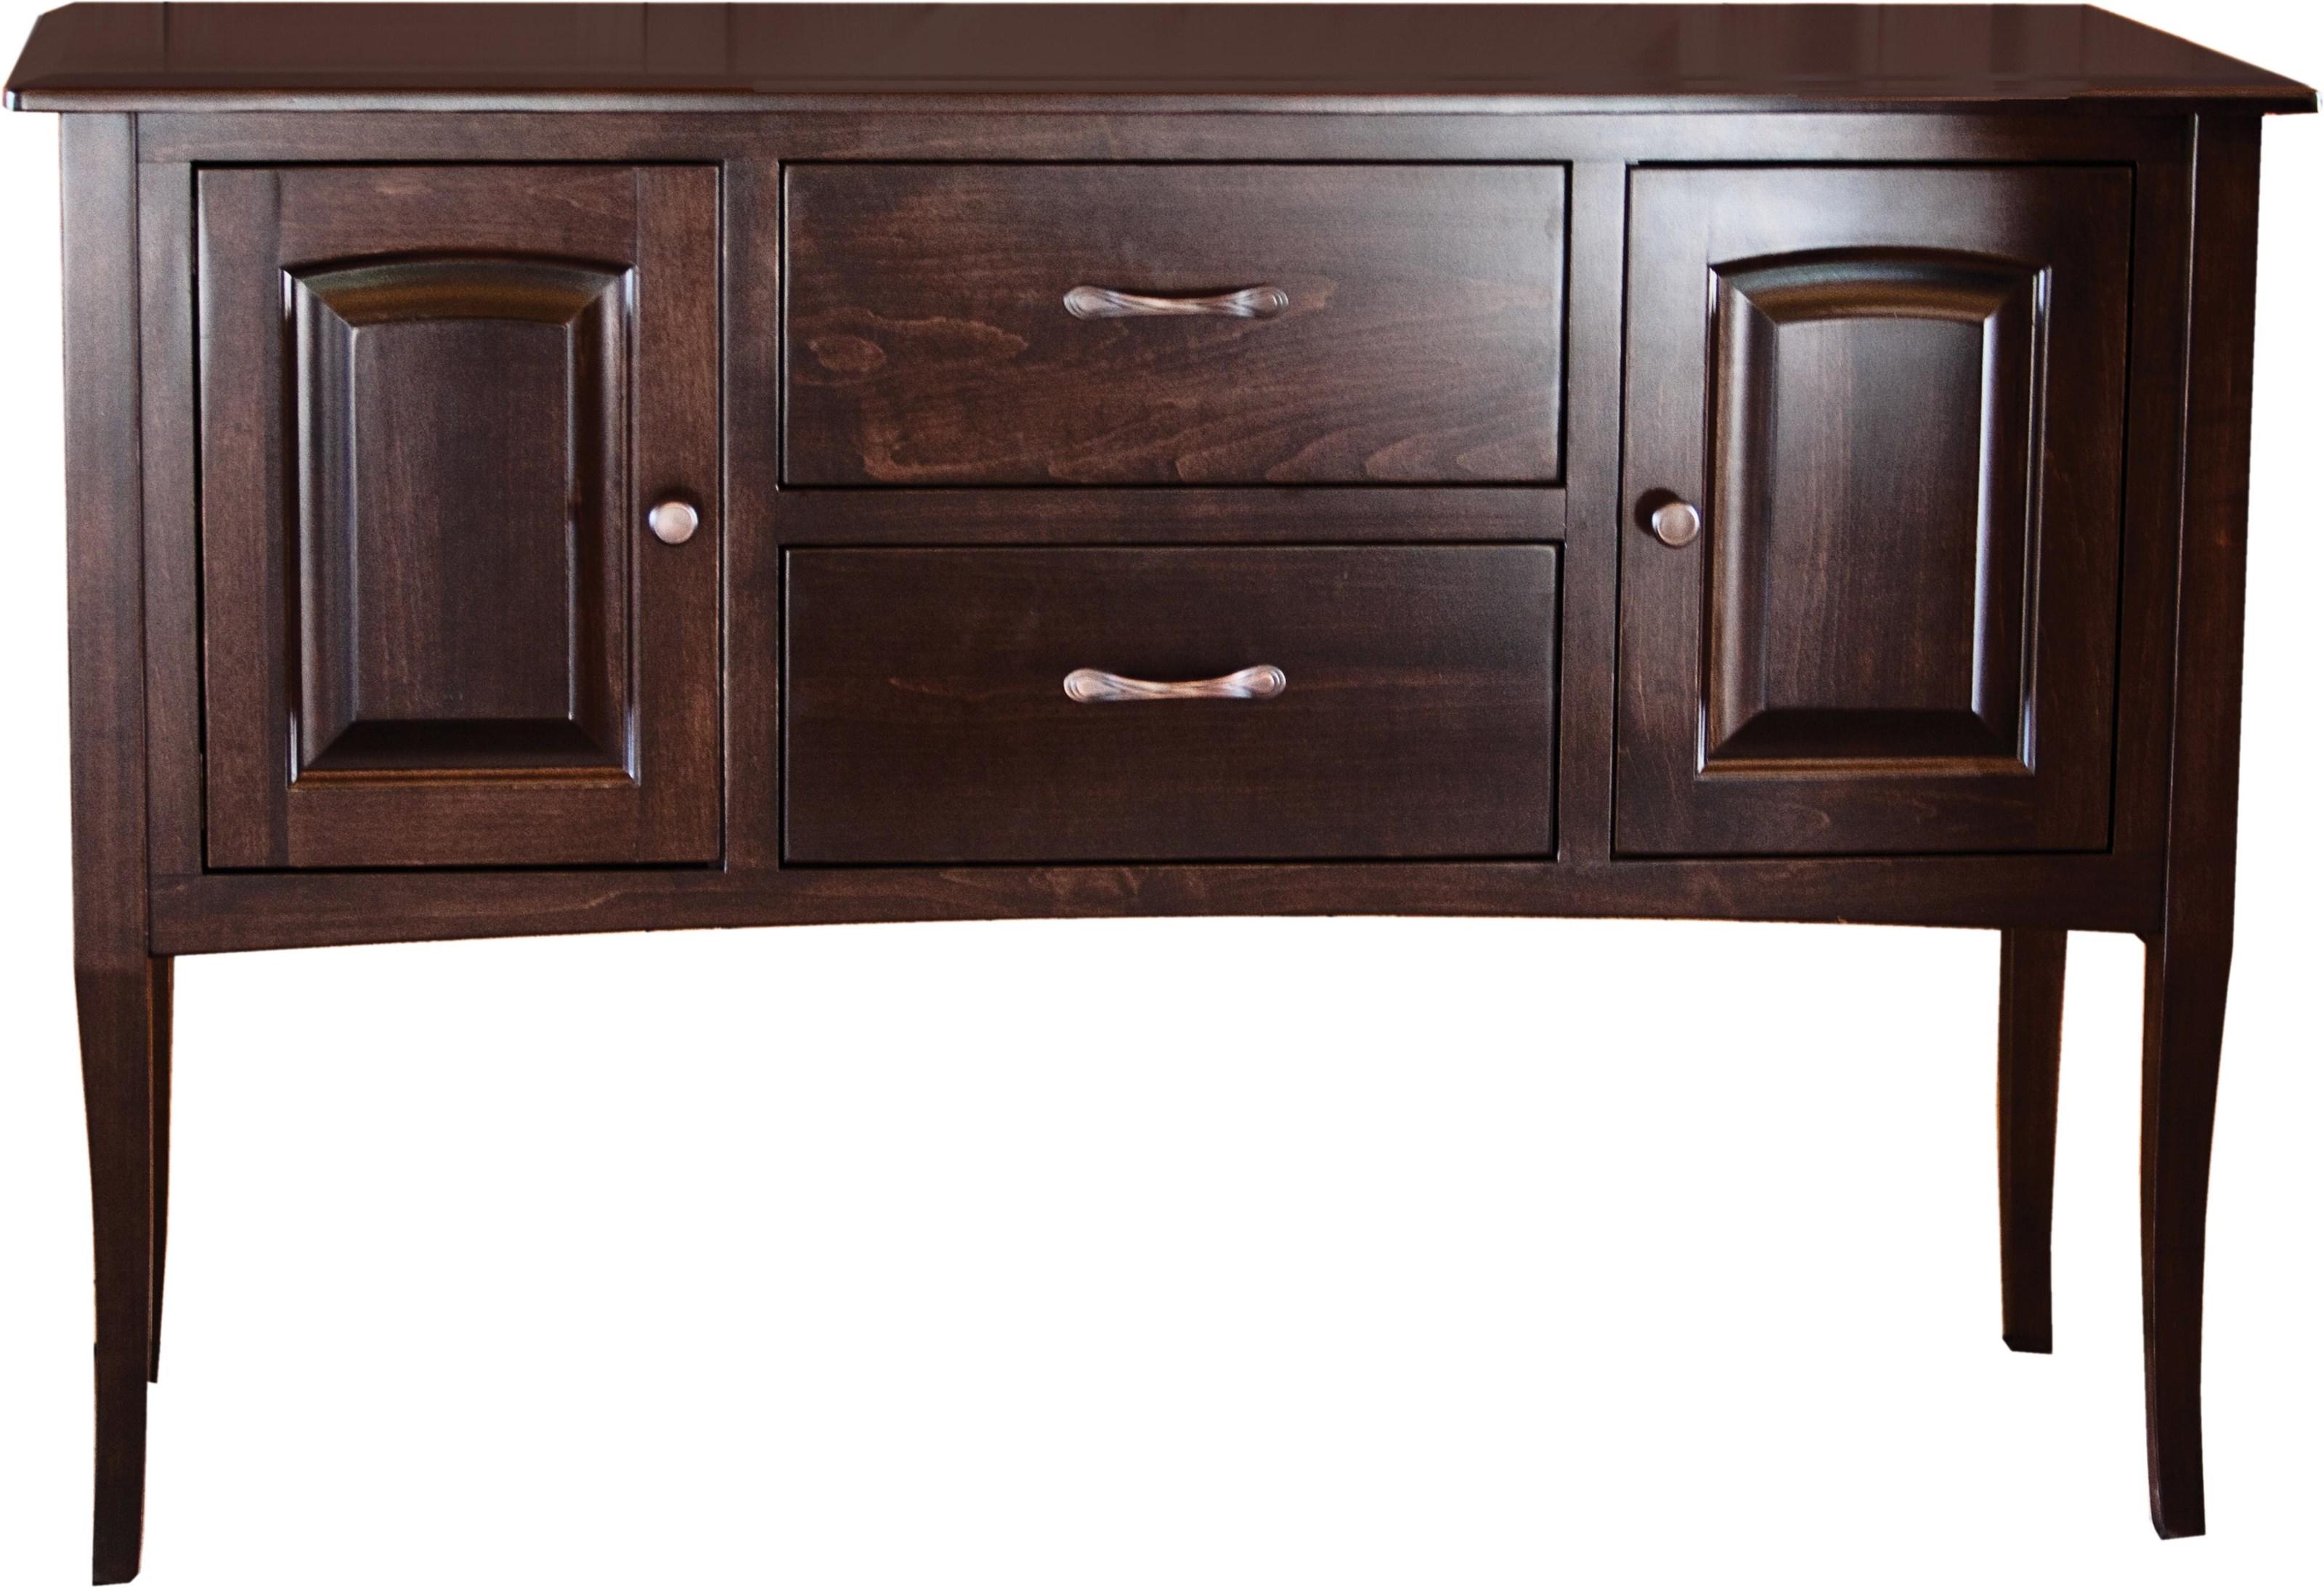 Rhapsody Sideboard by Oakwood Industries at Crowley Furniture & Mattress